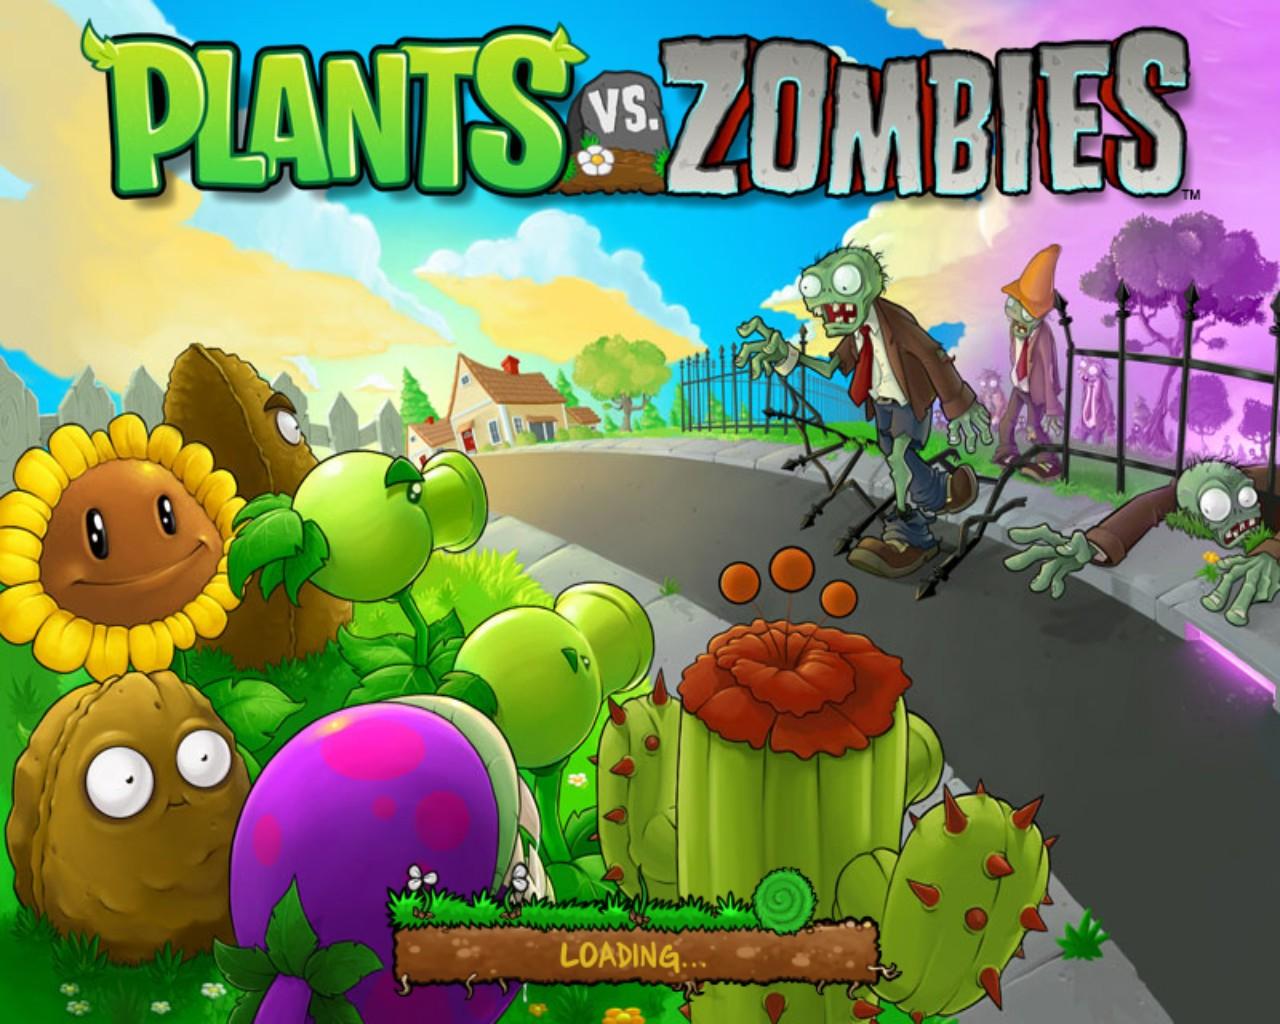 raul informatica's: plants vs zombies - jogo completo